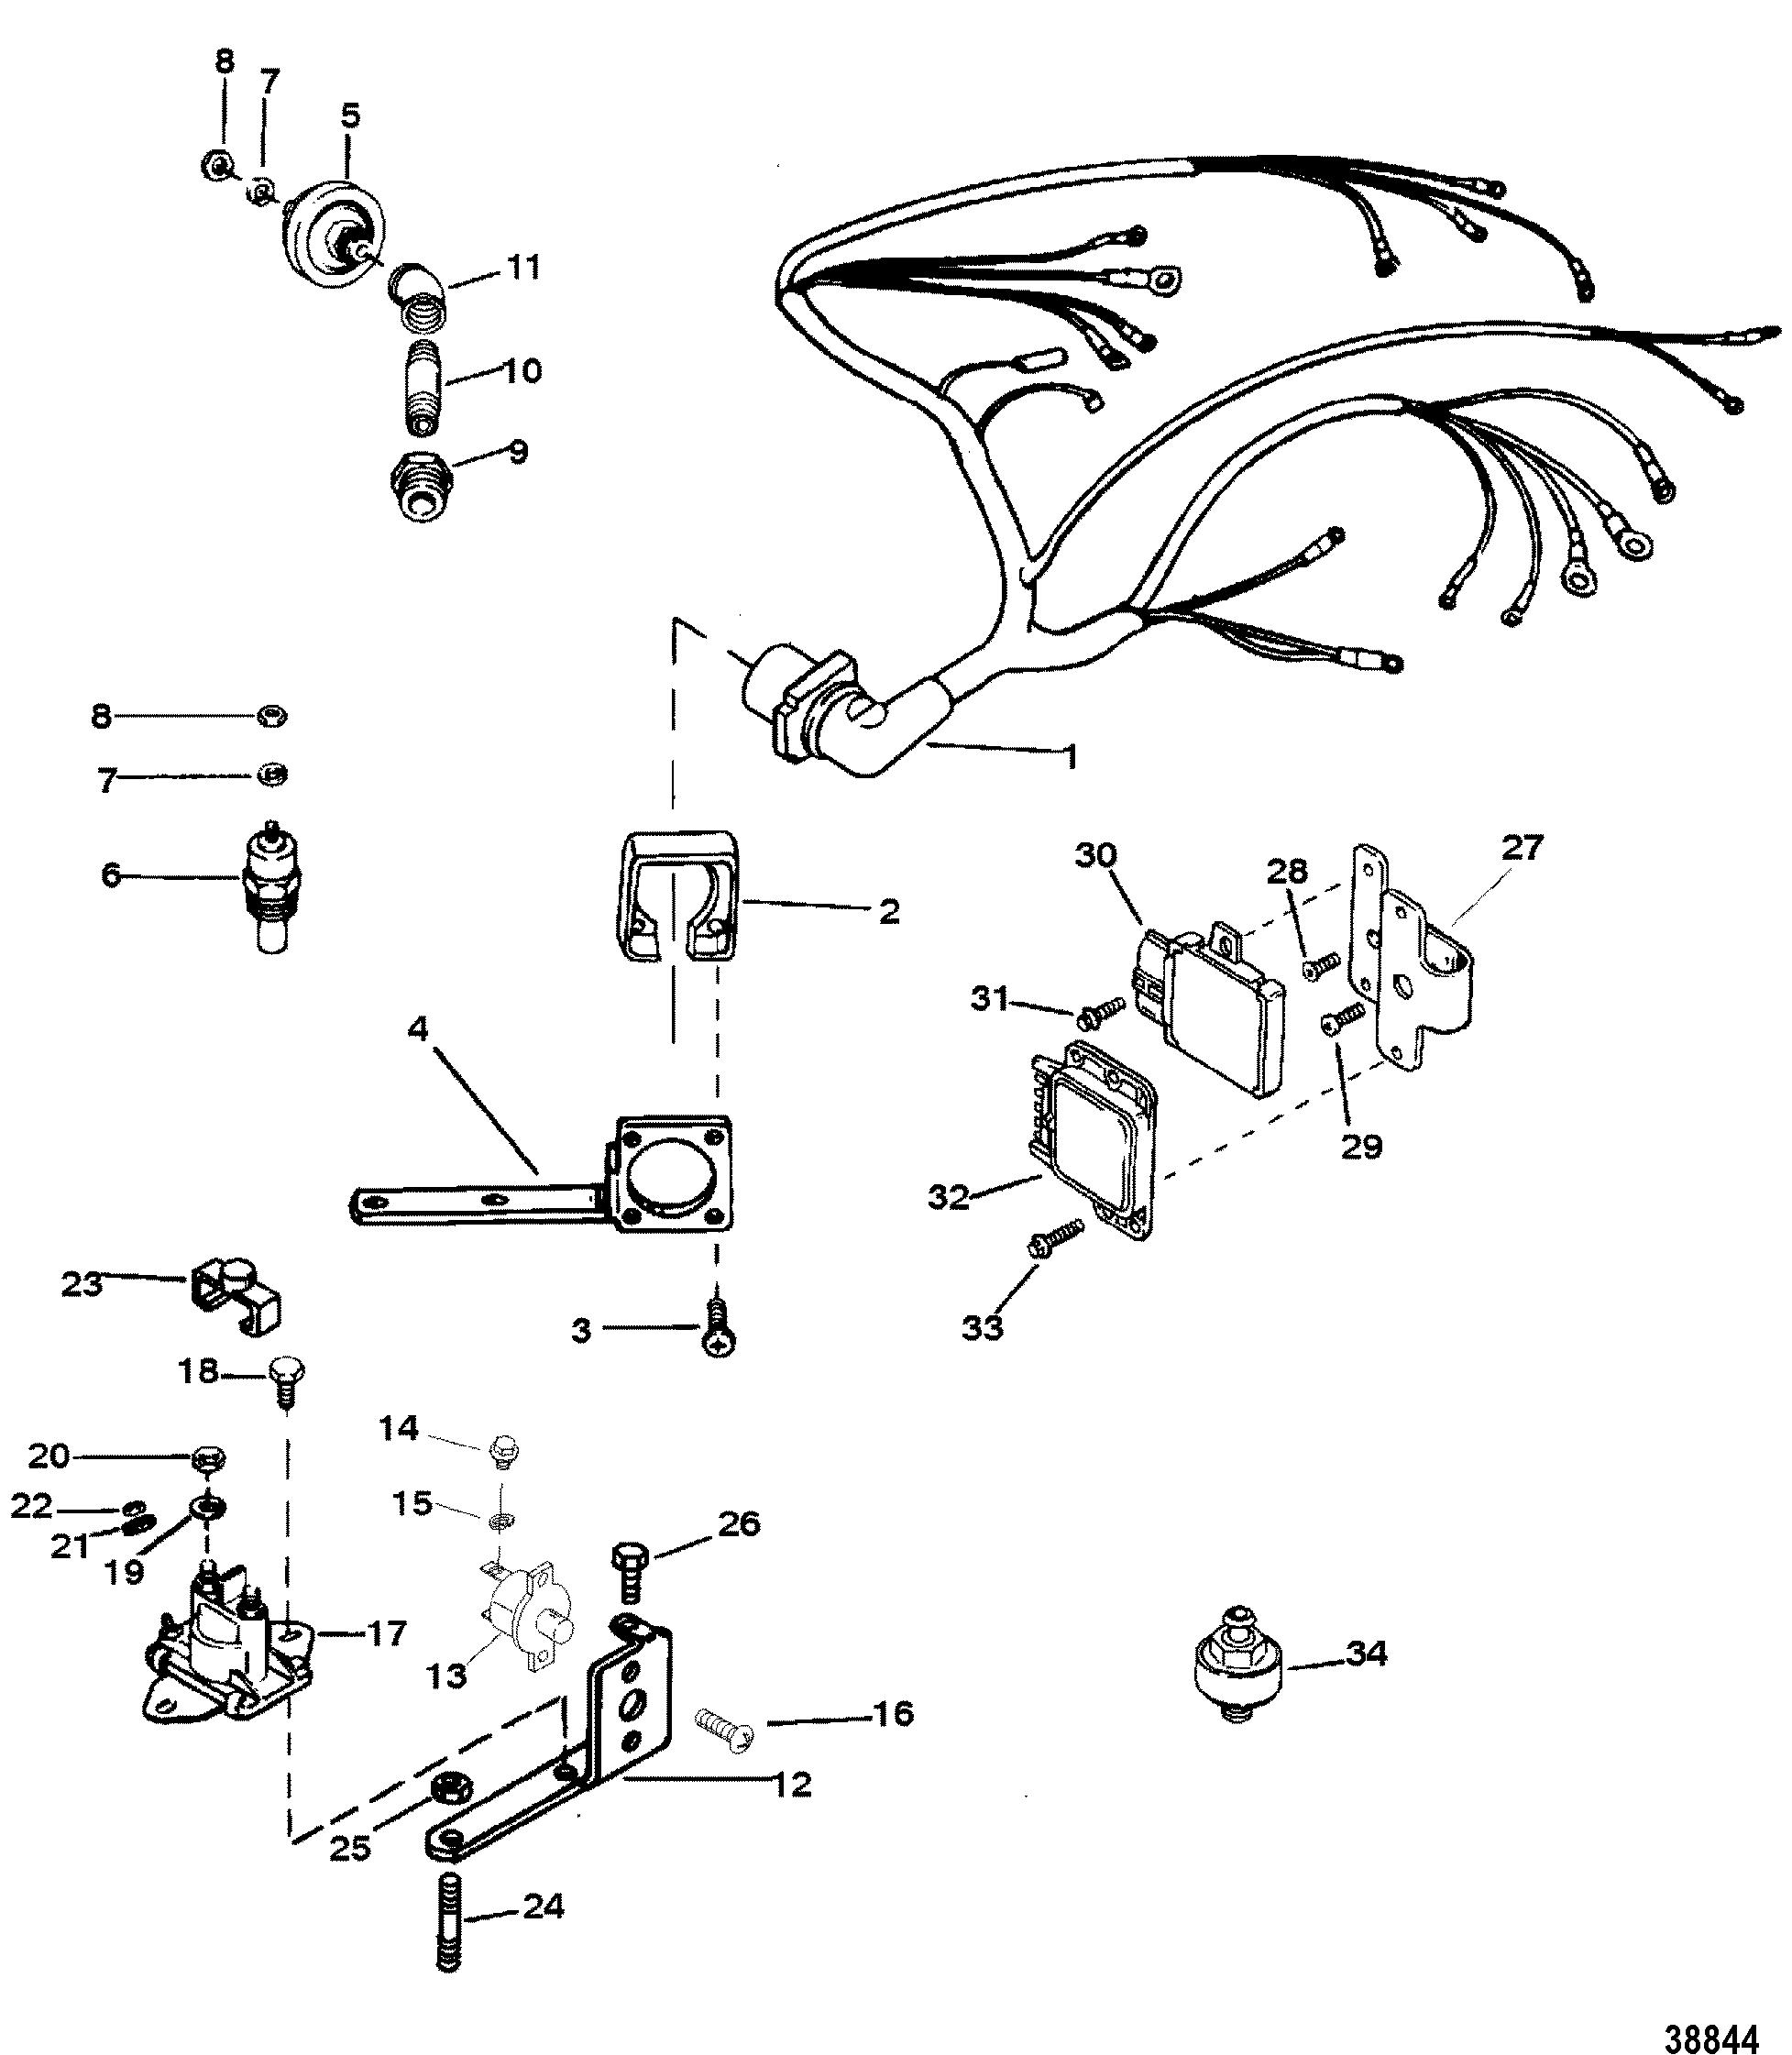 Hardin Marine - Wiring Harness-Electrical (Thunderbolt V Ignition)Hardin Marine